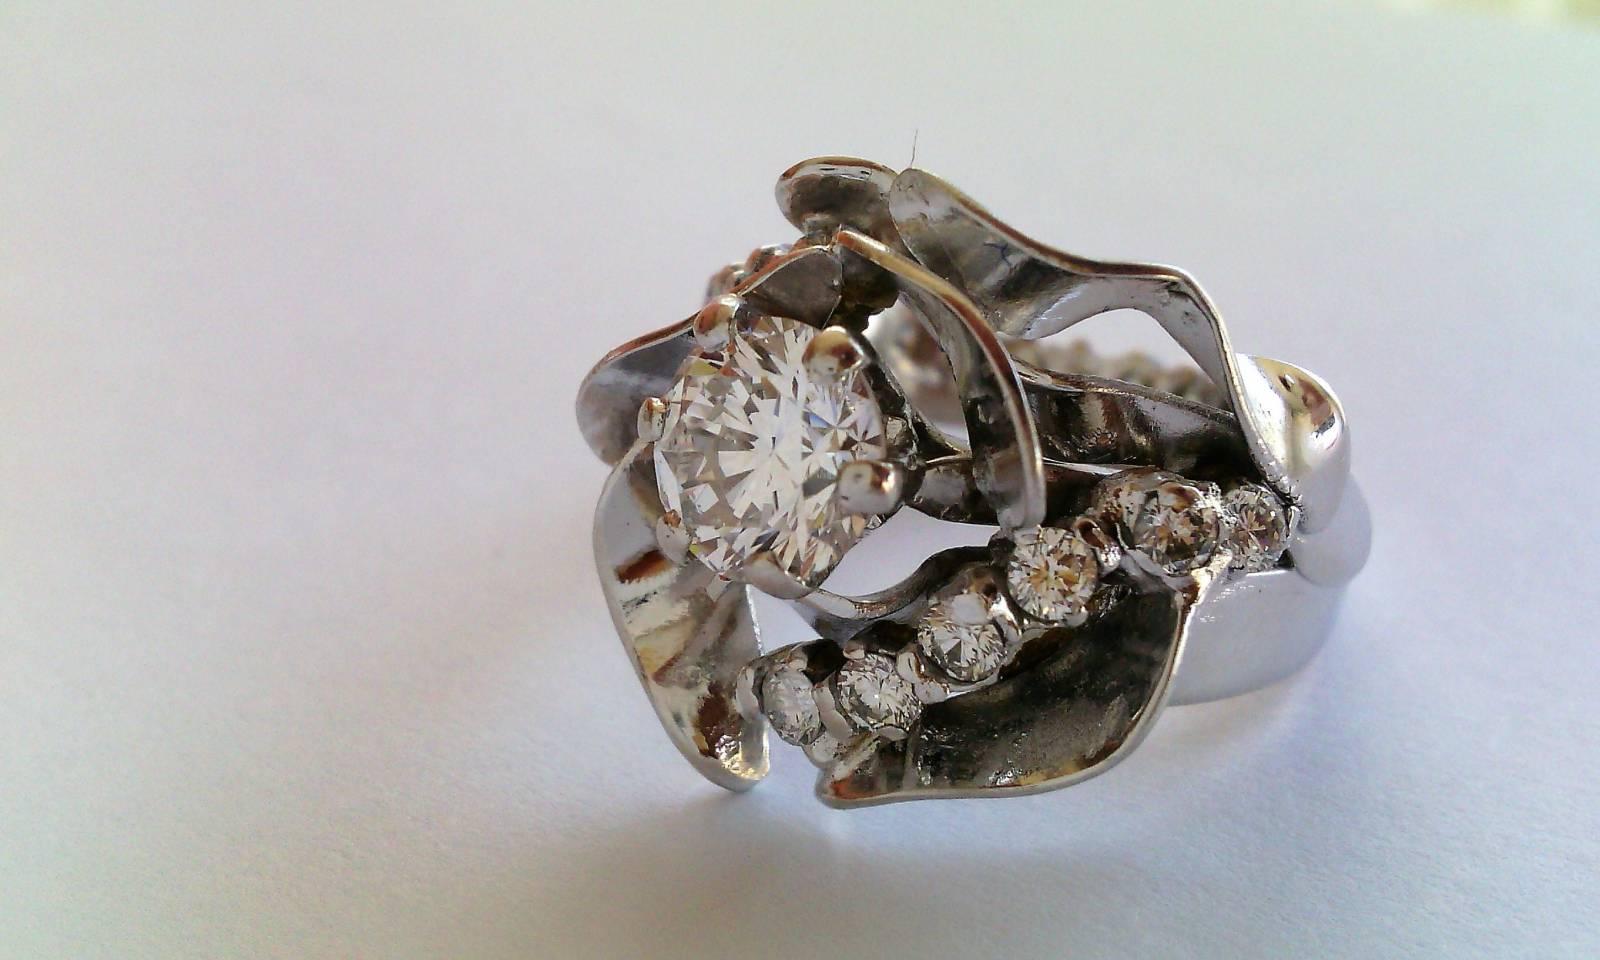 Nathalie Swinnen - Juwelen - Bruidsjuwelen - Verlovingsring - Trouwring - House of Weddings - 31